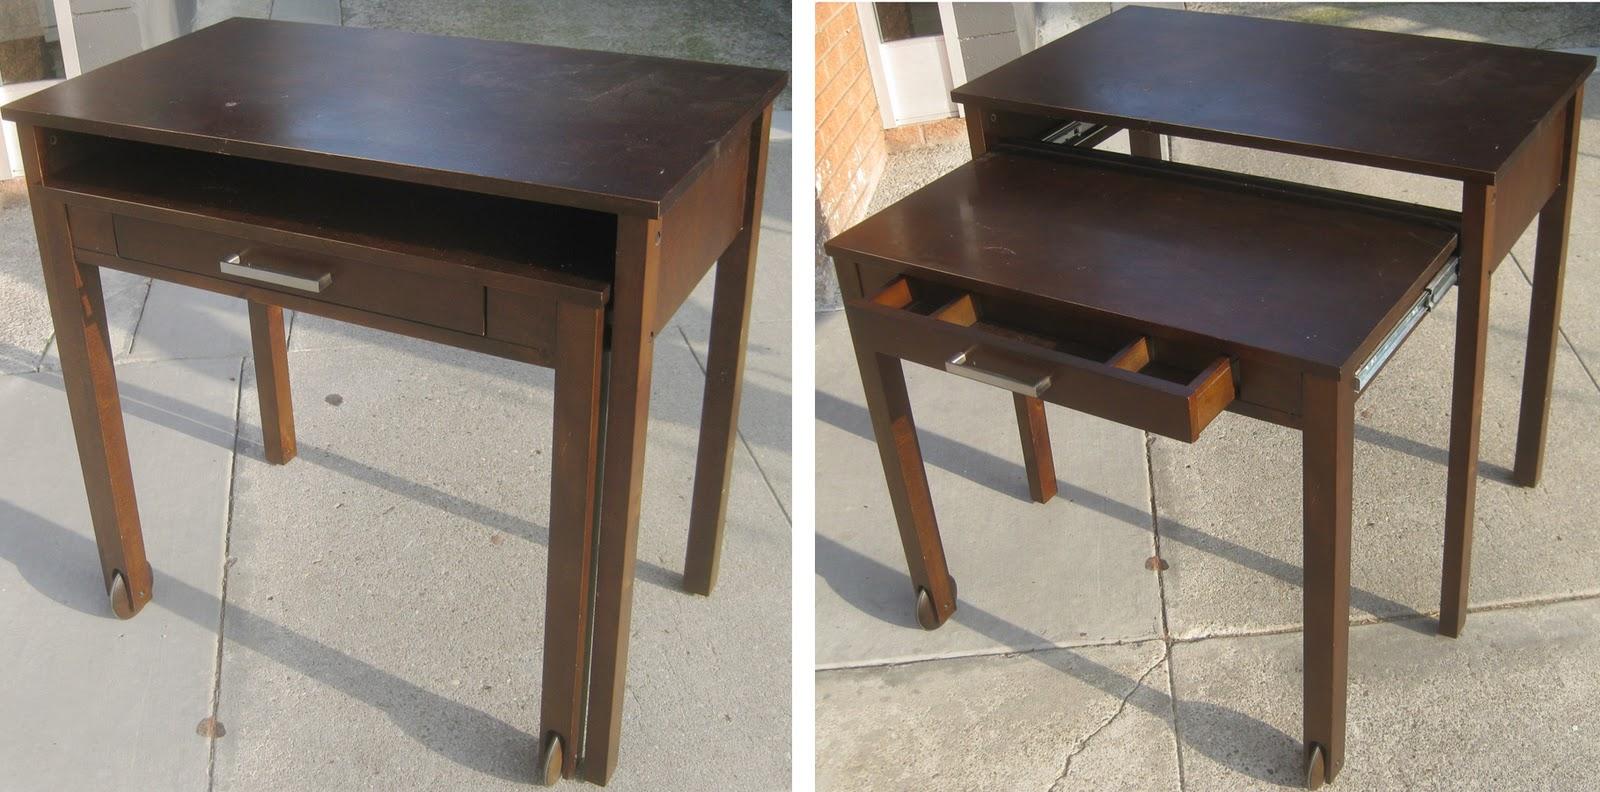 Merveilleux SOLD   Retractable Desk   $125